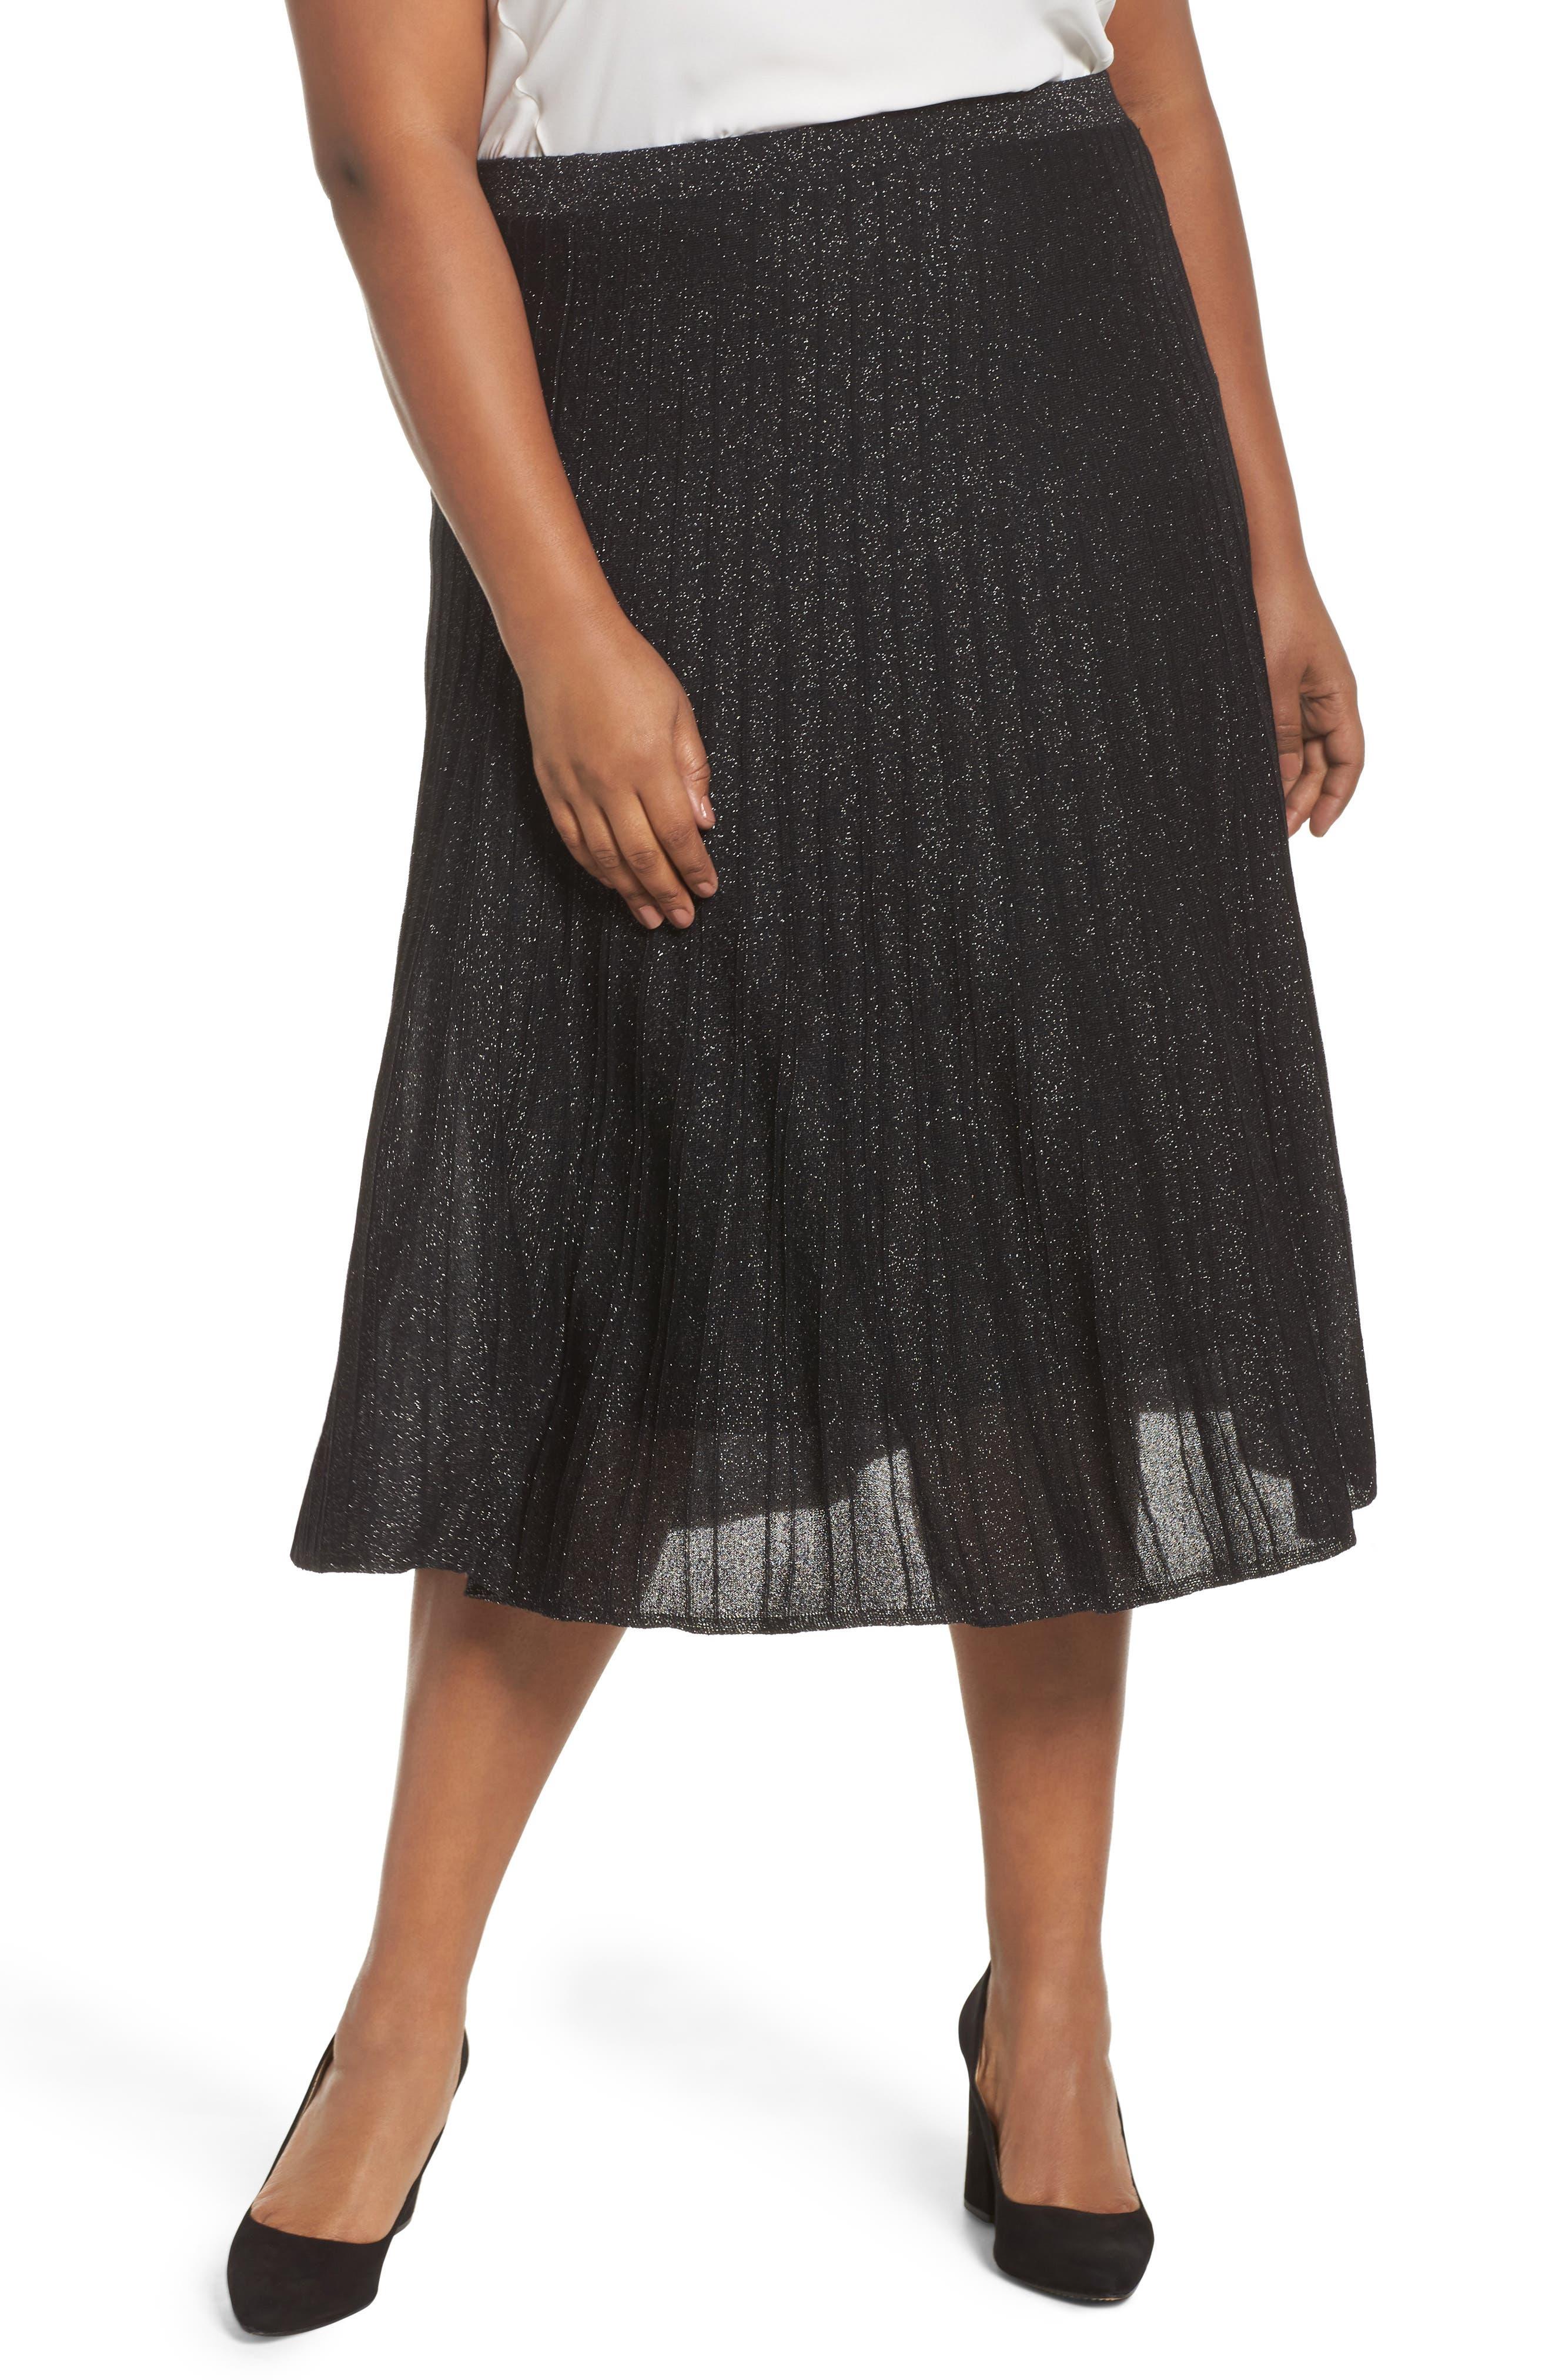 Luminary Skirt,                             Main thumbnail 1, color,                             Black Mix